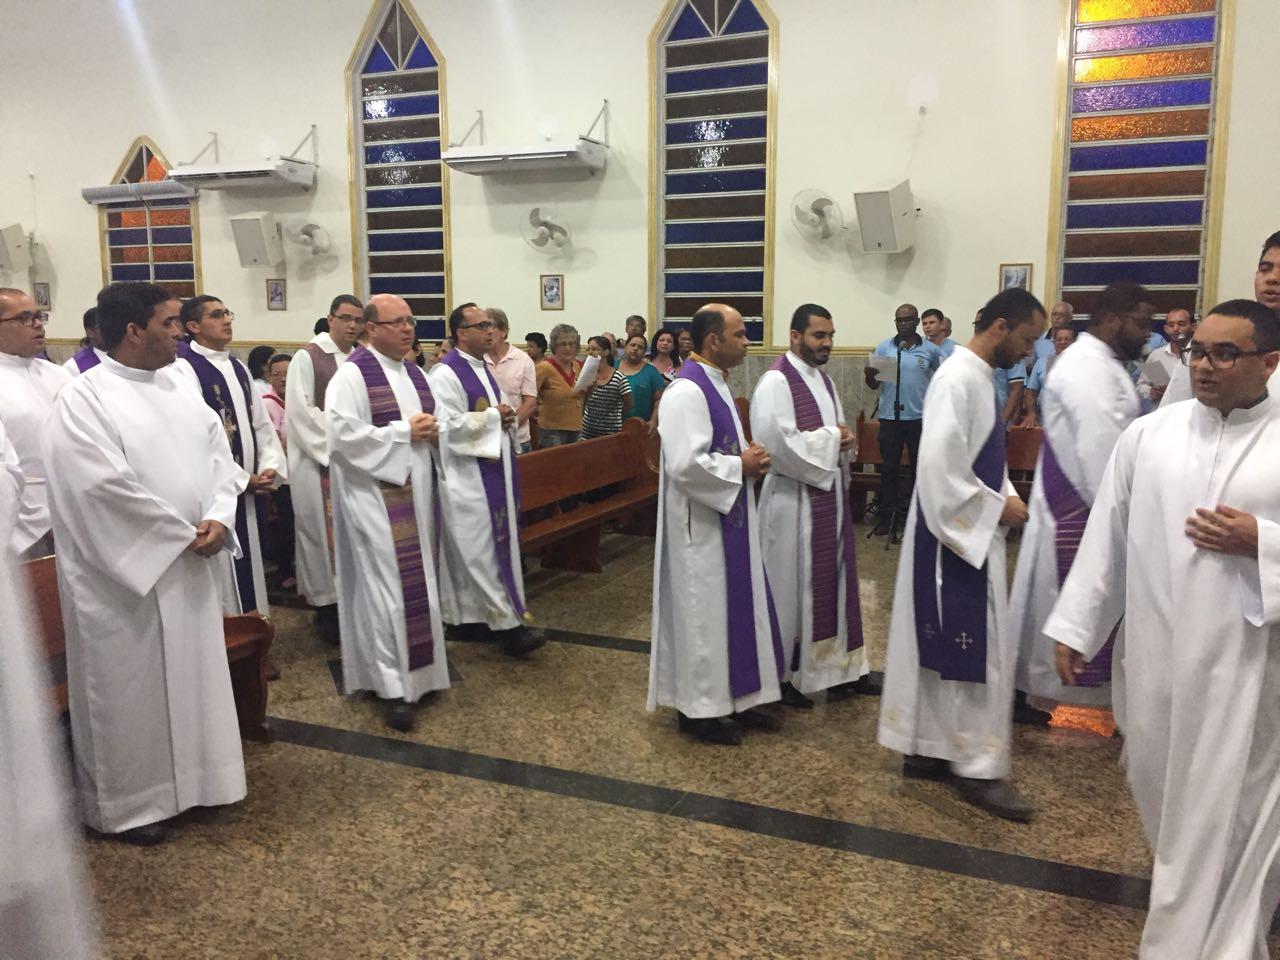 DOM FÉLIX CONFERE MINISTÉRIOS A SEMINARISTAS